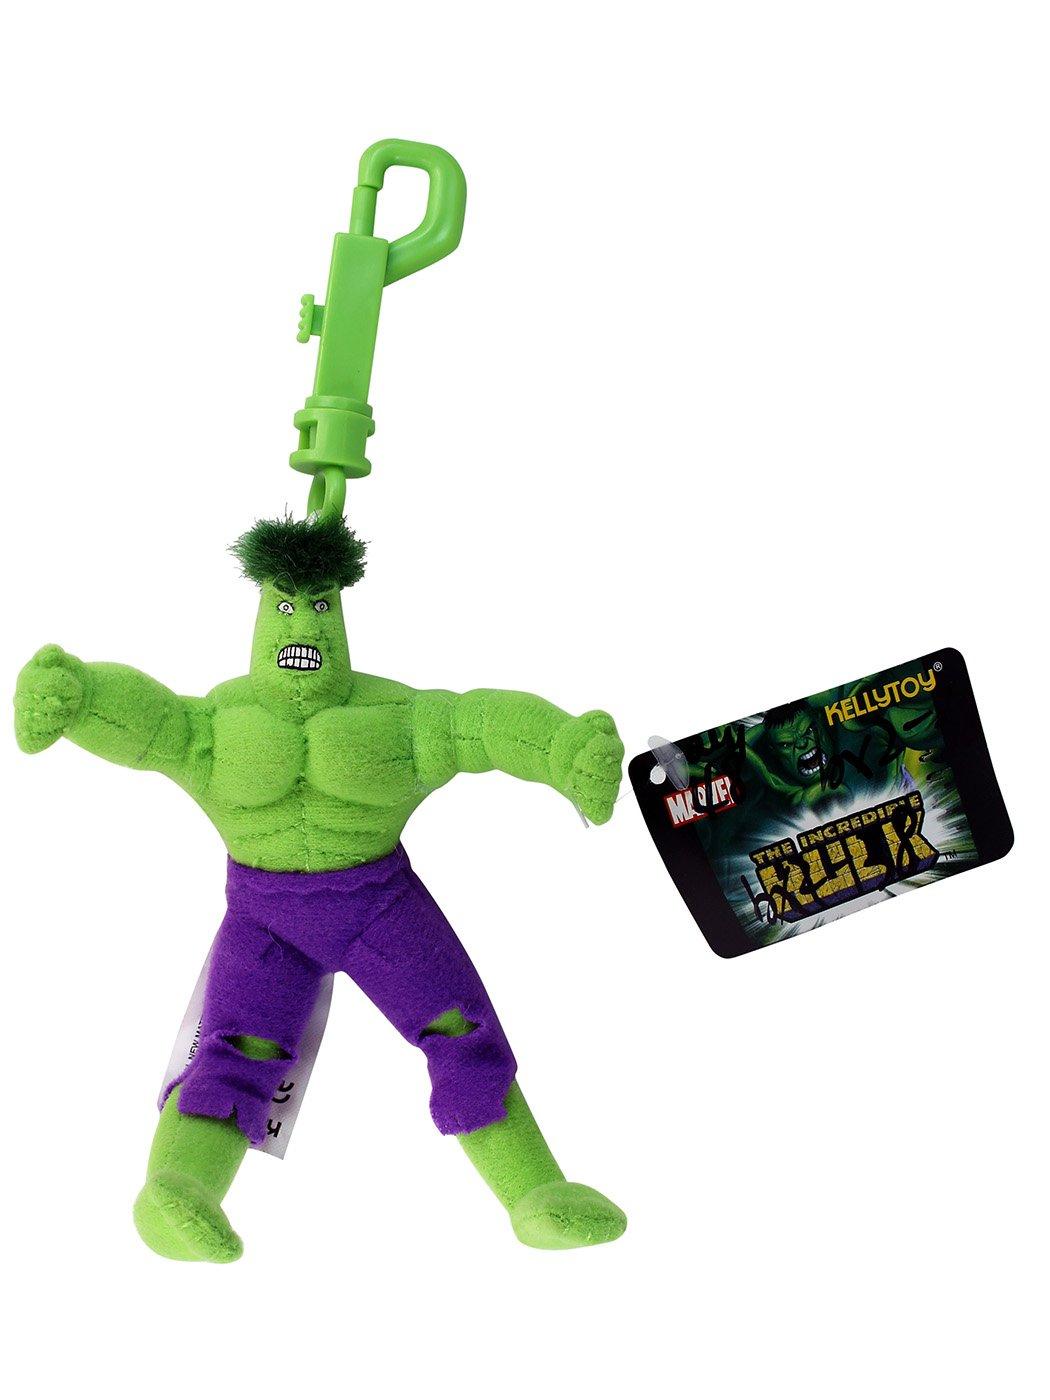 Marvel Mini Hulk Peluche Llavero - The Hulk Llavero: Amazon ...